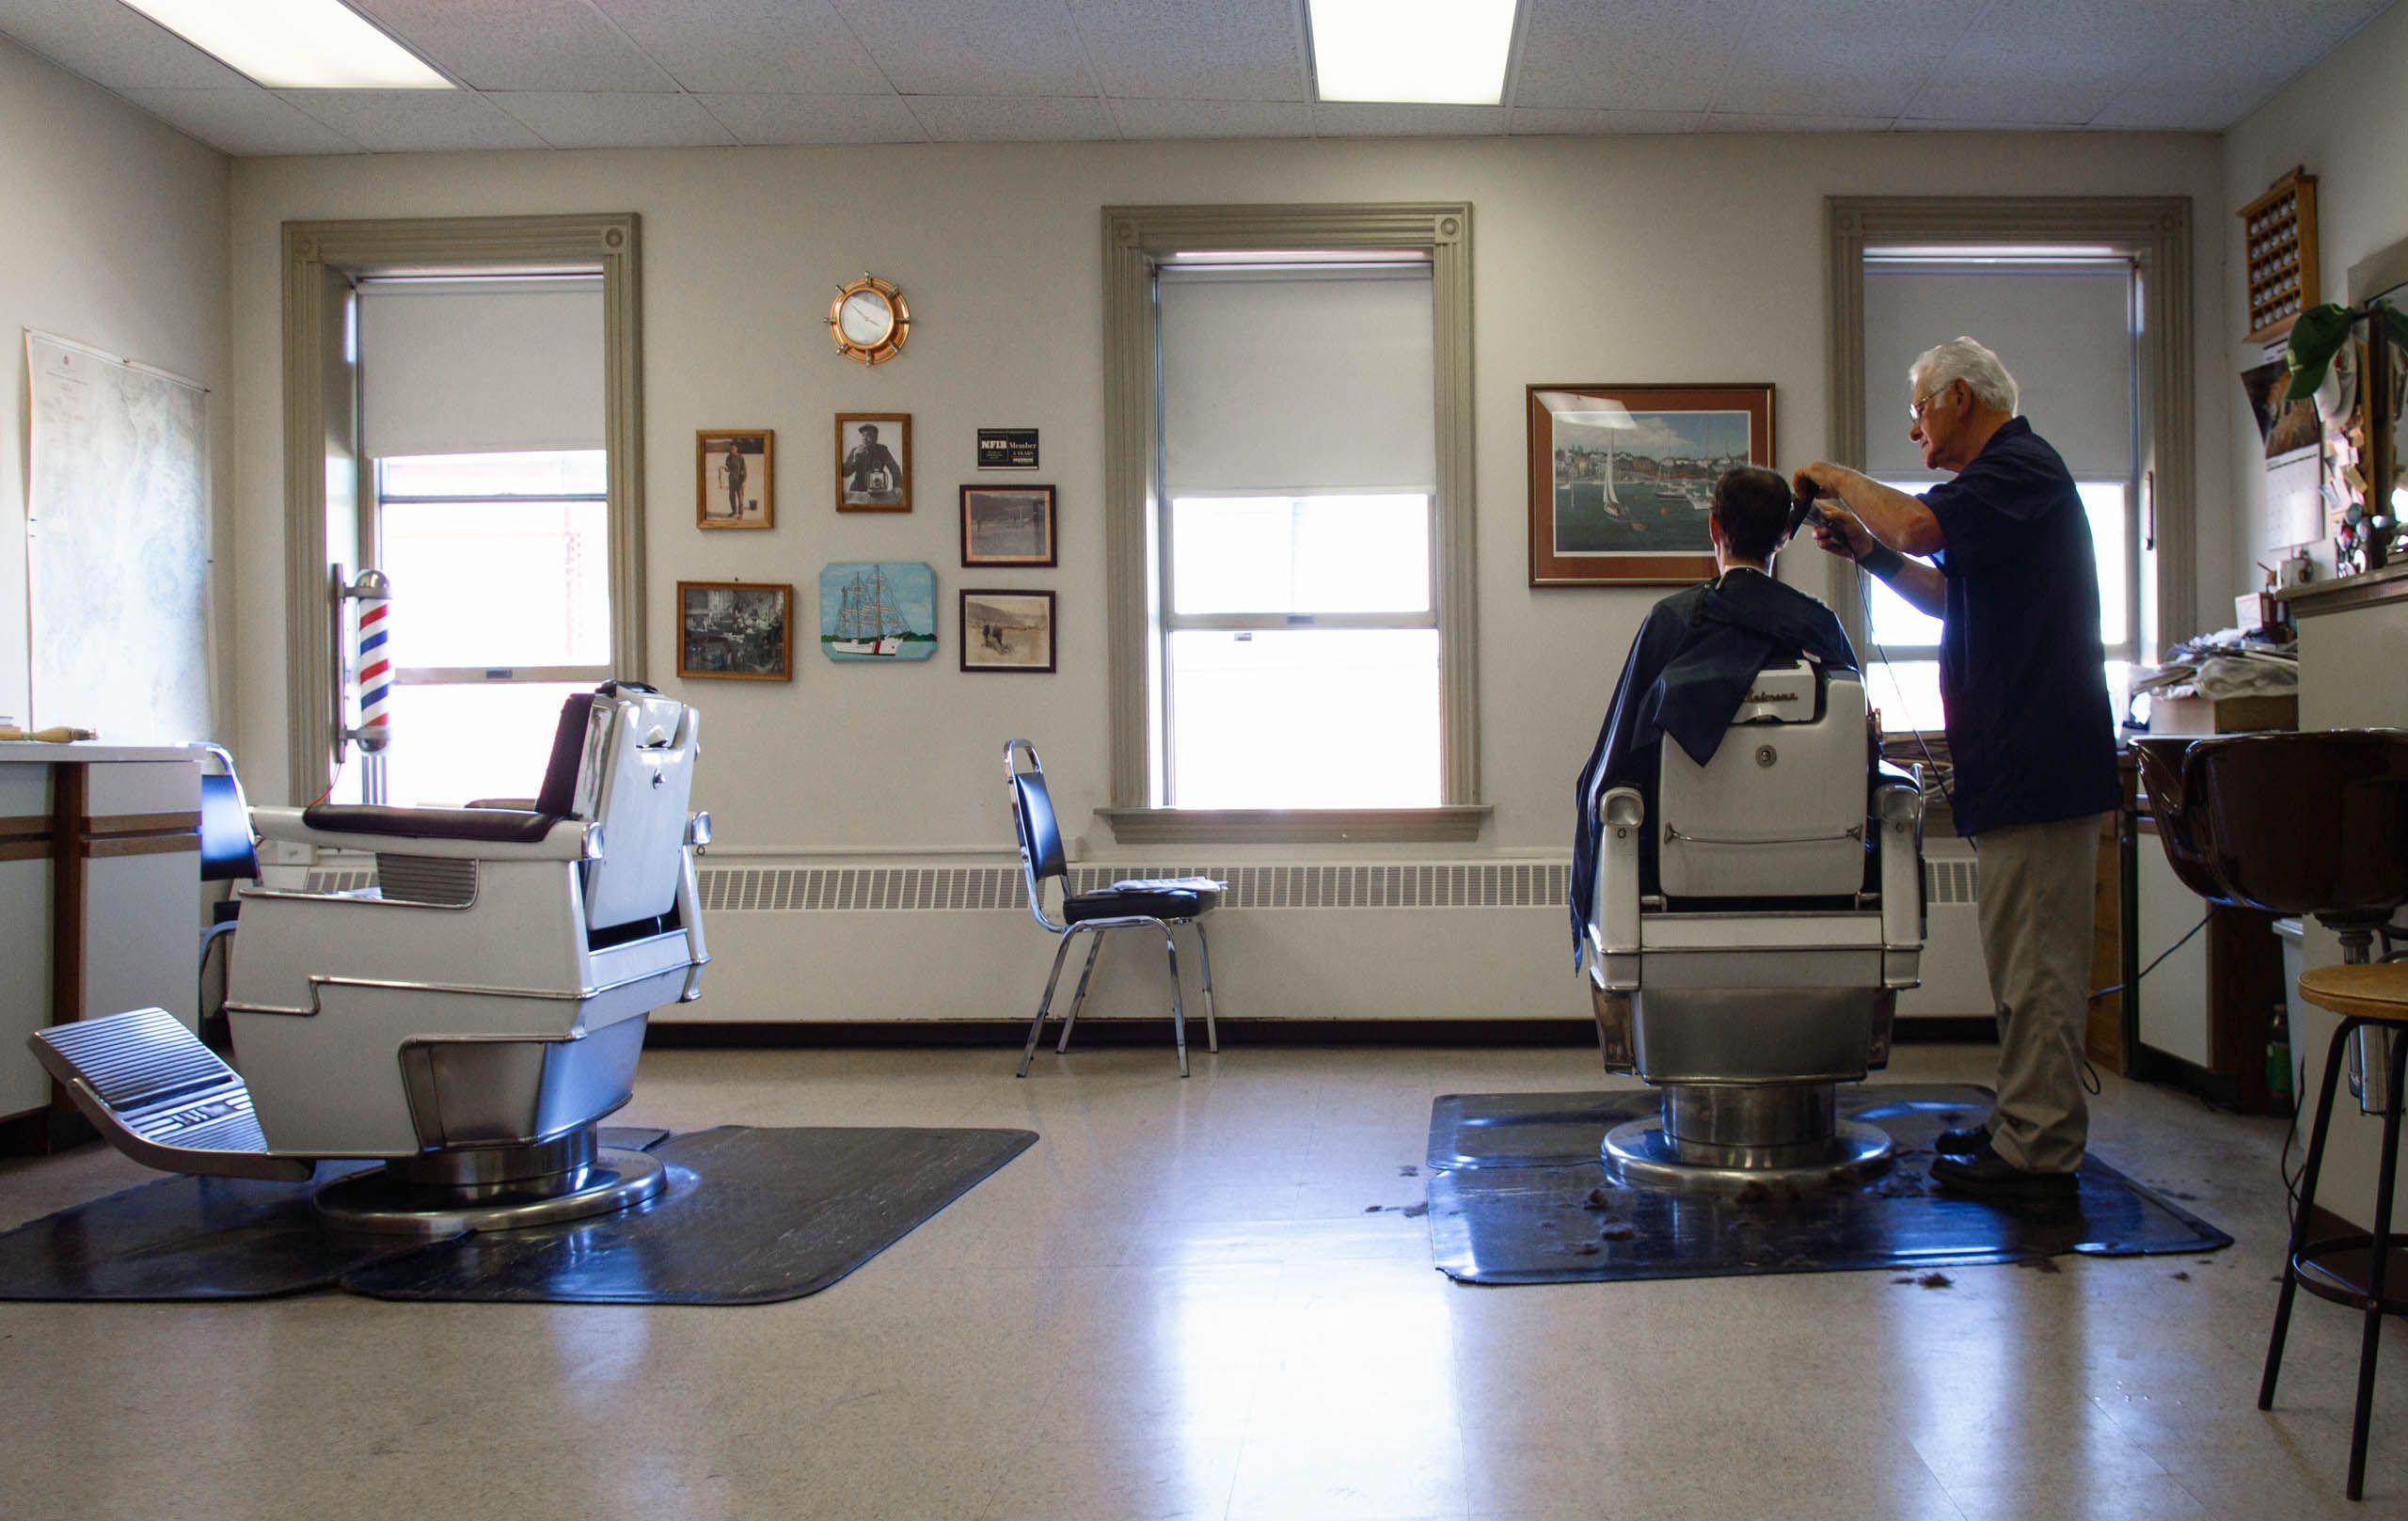 camden_barber_2012.jpg